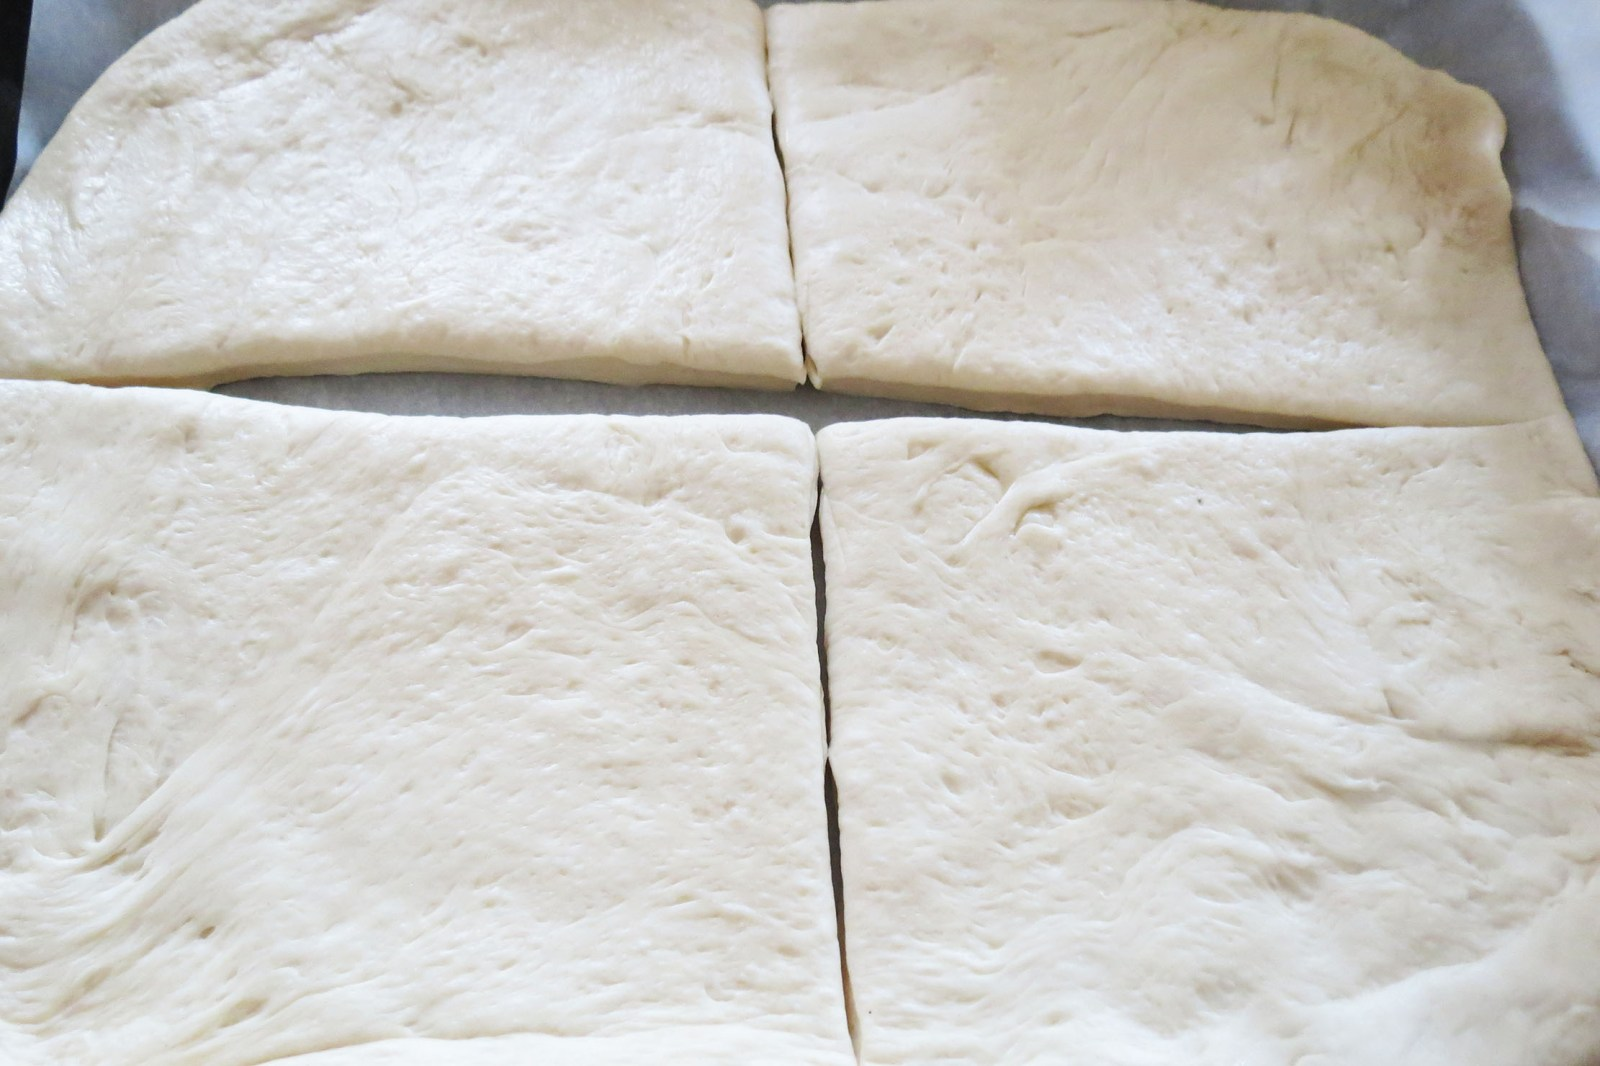 slicing-dough-focaccia- bread